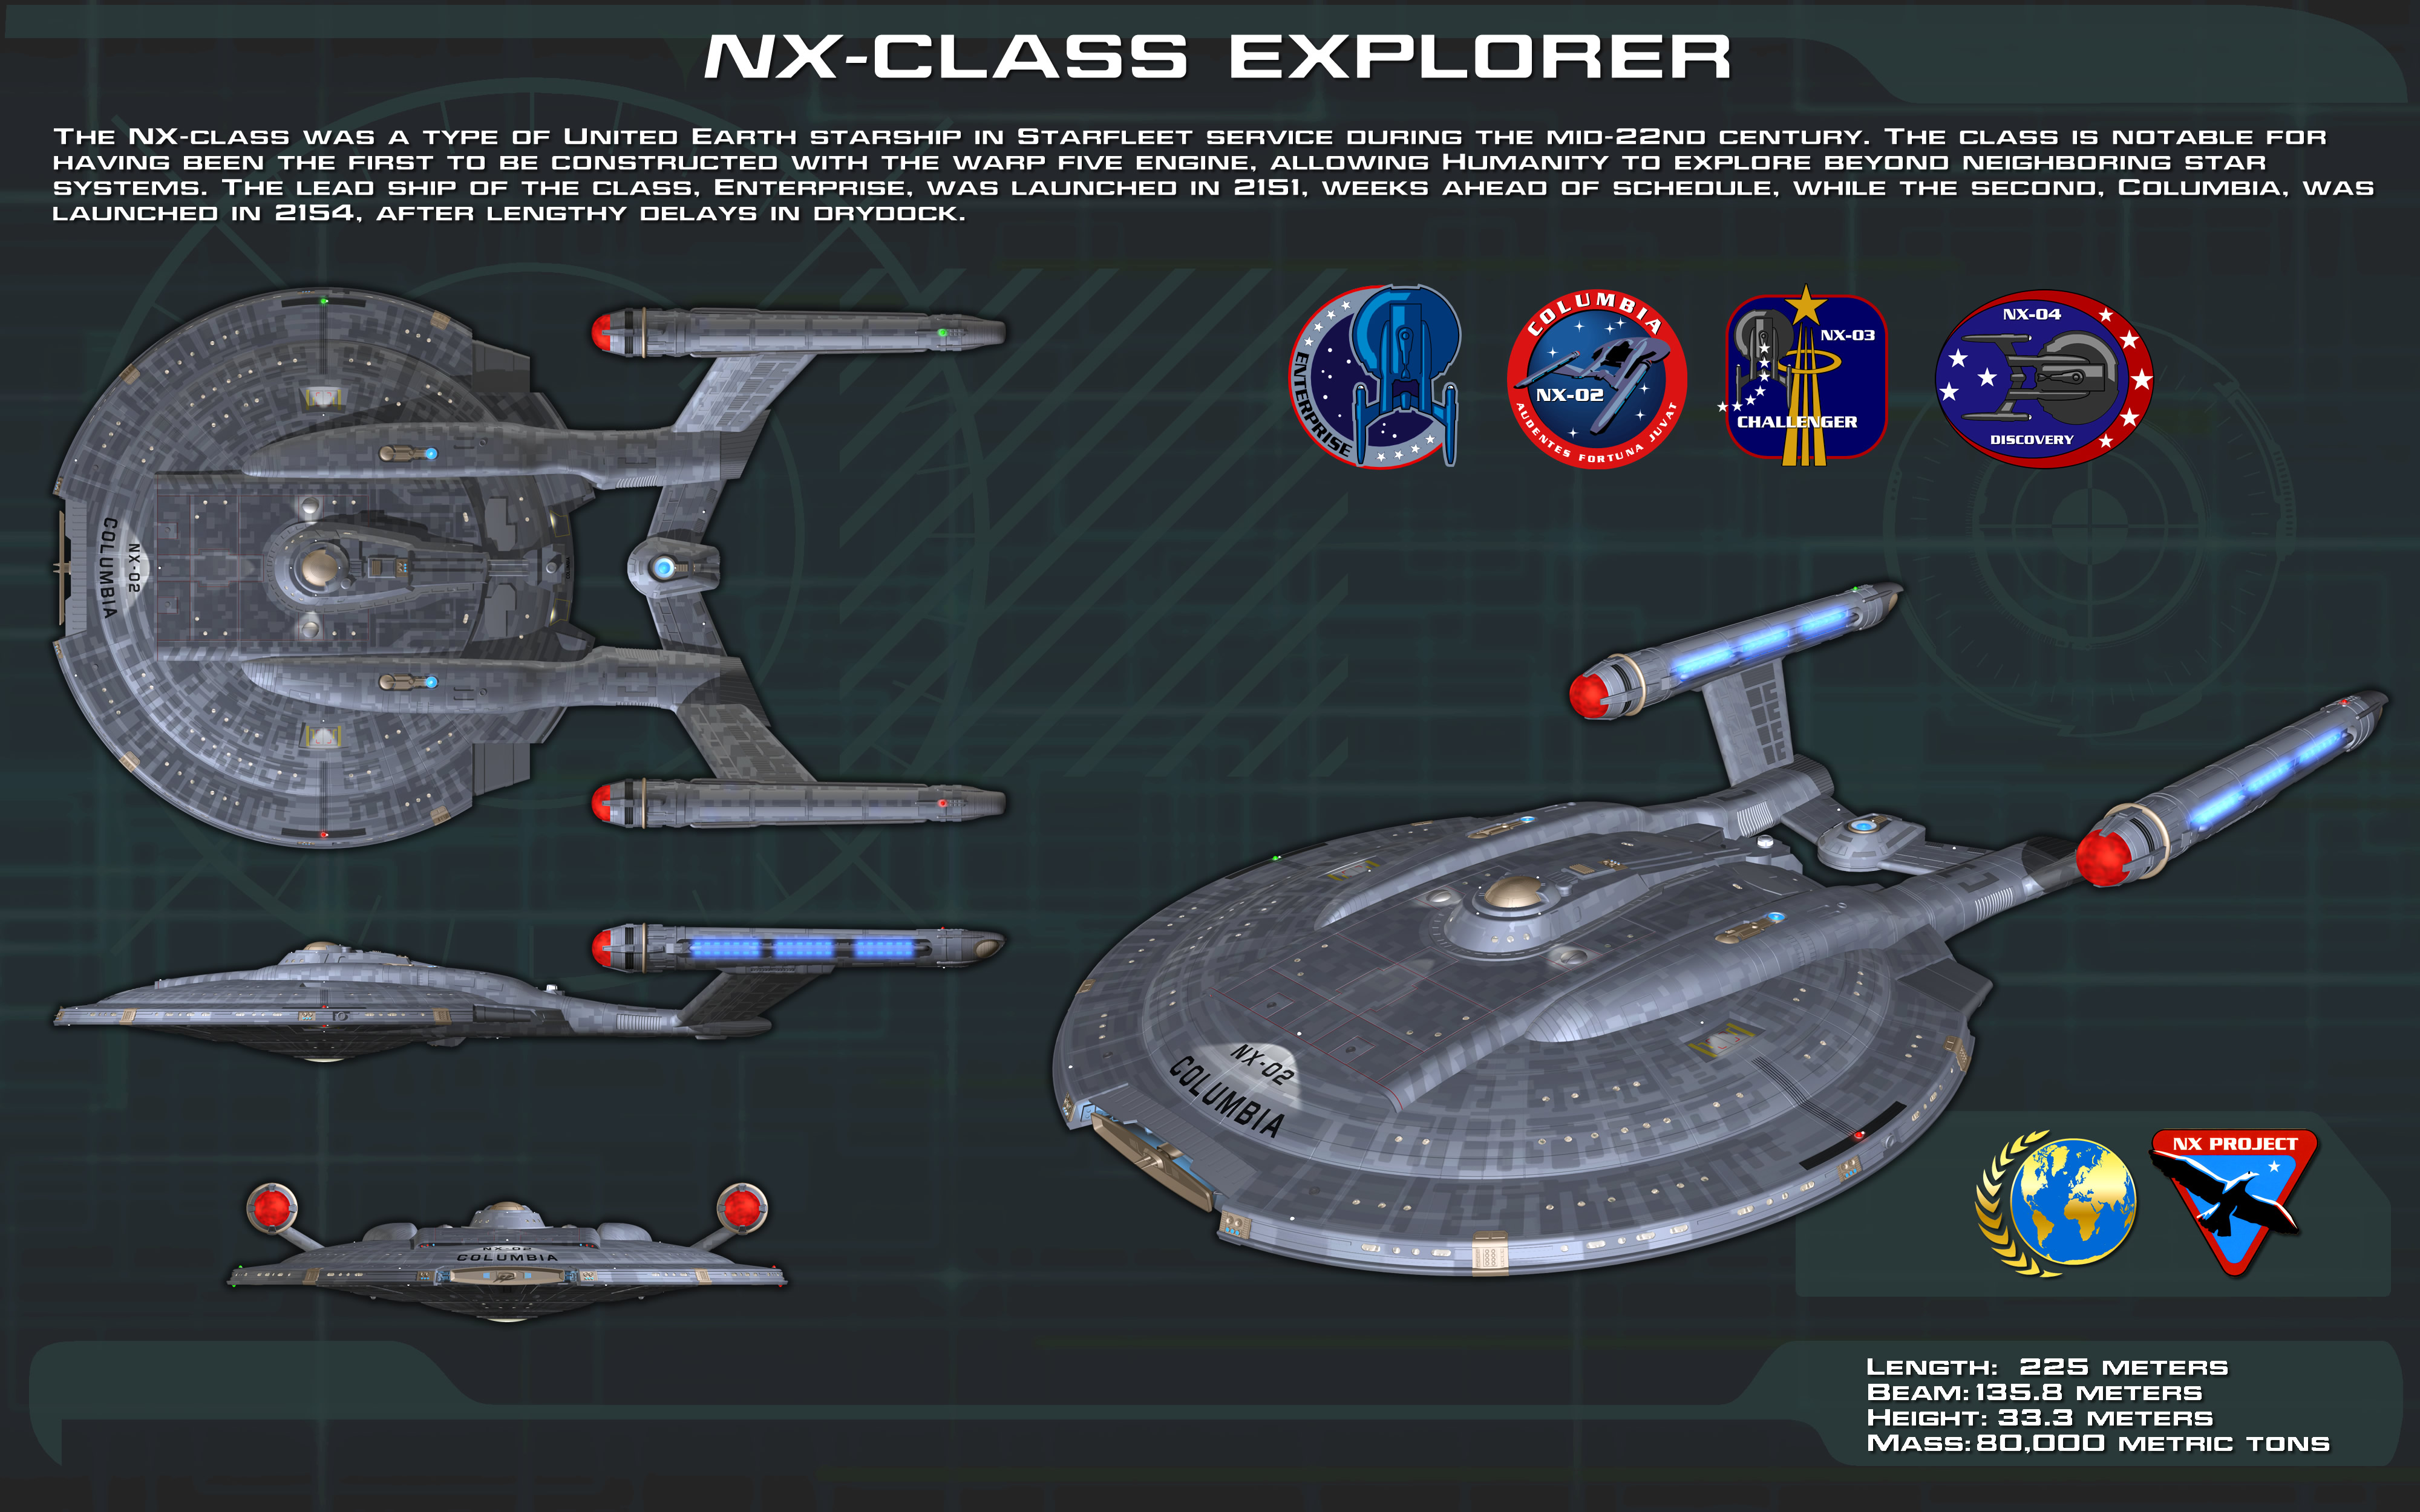 NX Class by FBOMBheart on DeviantArt